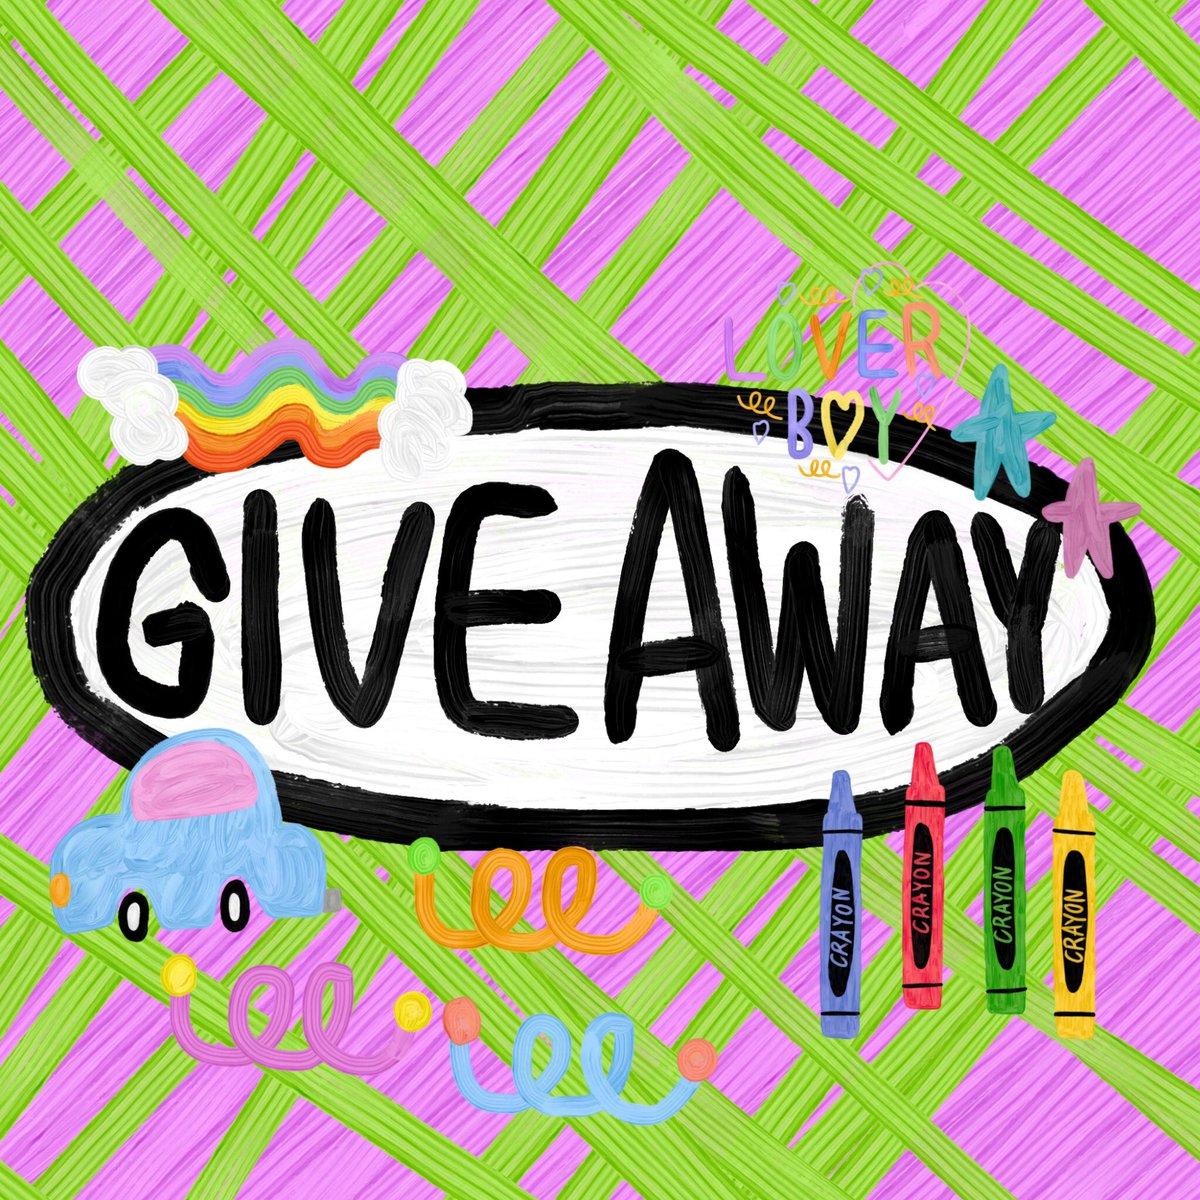 ———🎞🕯𝐆𝐈𝐕𝐄 𝐀𝐖𝐀𝐘🌲🐆——— 🧞♂️ฝากรี+ฟอลหน่อยนะ 🎢ตกแต่งสตอรี่ไอจีหรือโน๊ตอะไรก็ได้ค้าบ 🧚🏻♀️เดี๋ยวมาแจกอีกฮะ🌷 💿ห้ามใช้เชิงพาณิชย์✨ #แจกpng #goodnotes #goodnote #png #giveaway      ไฟล์อยู่ในลิ้งค์เลยยยย👇🏻👇🏻👇🏻